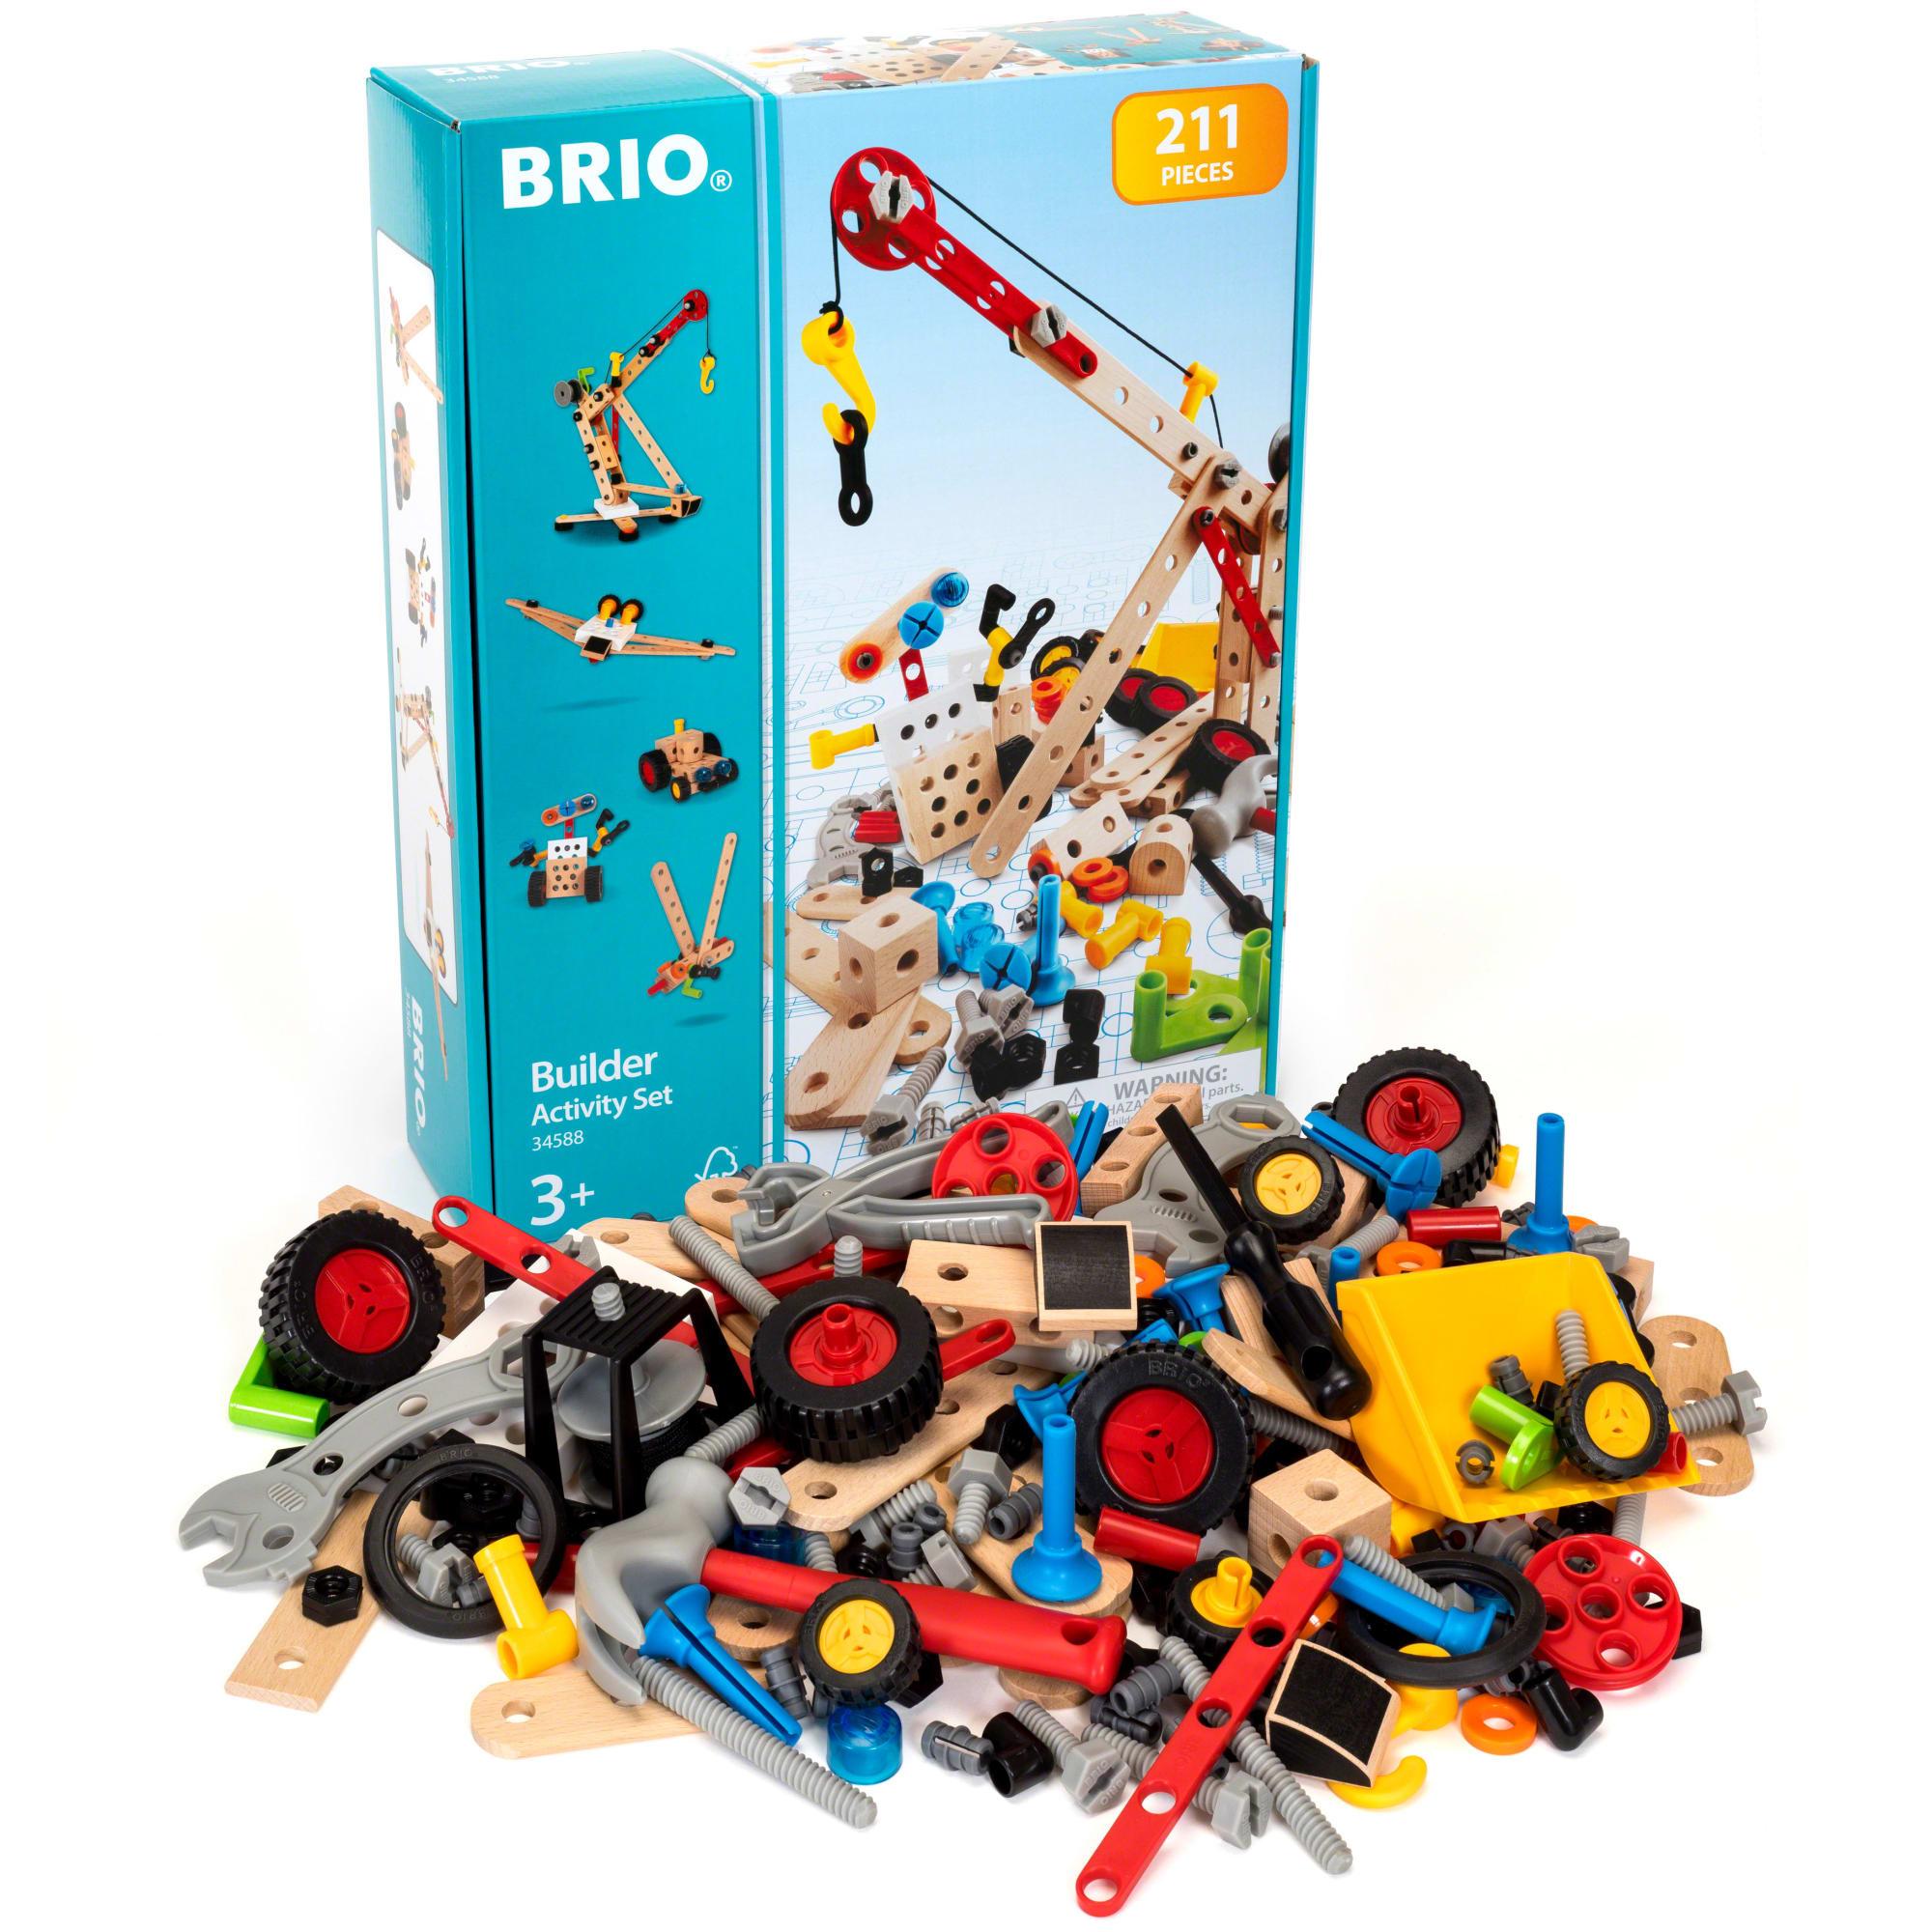 211 dele - Byg en kran, en flyvemaskine eller et fantasivæsen